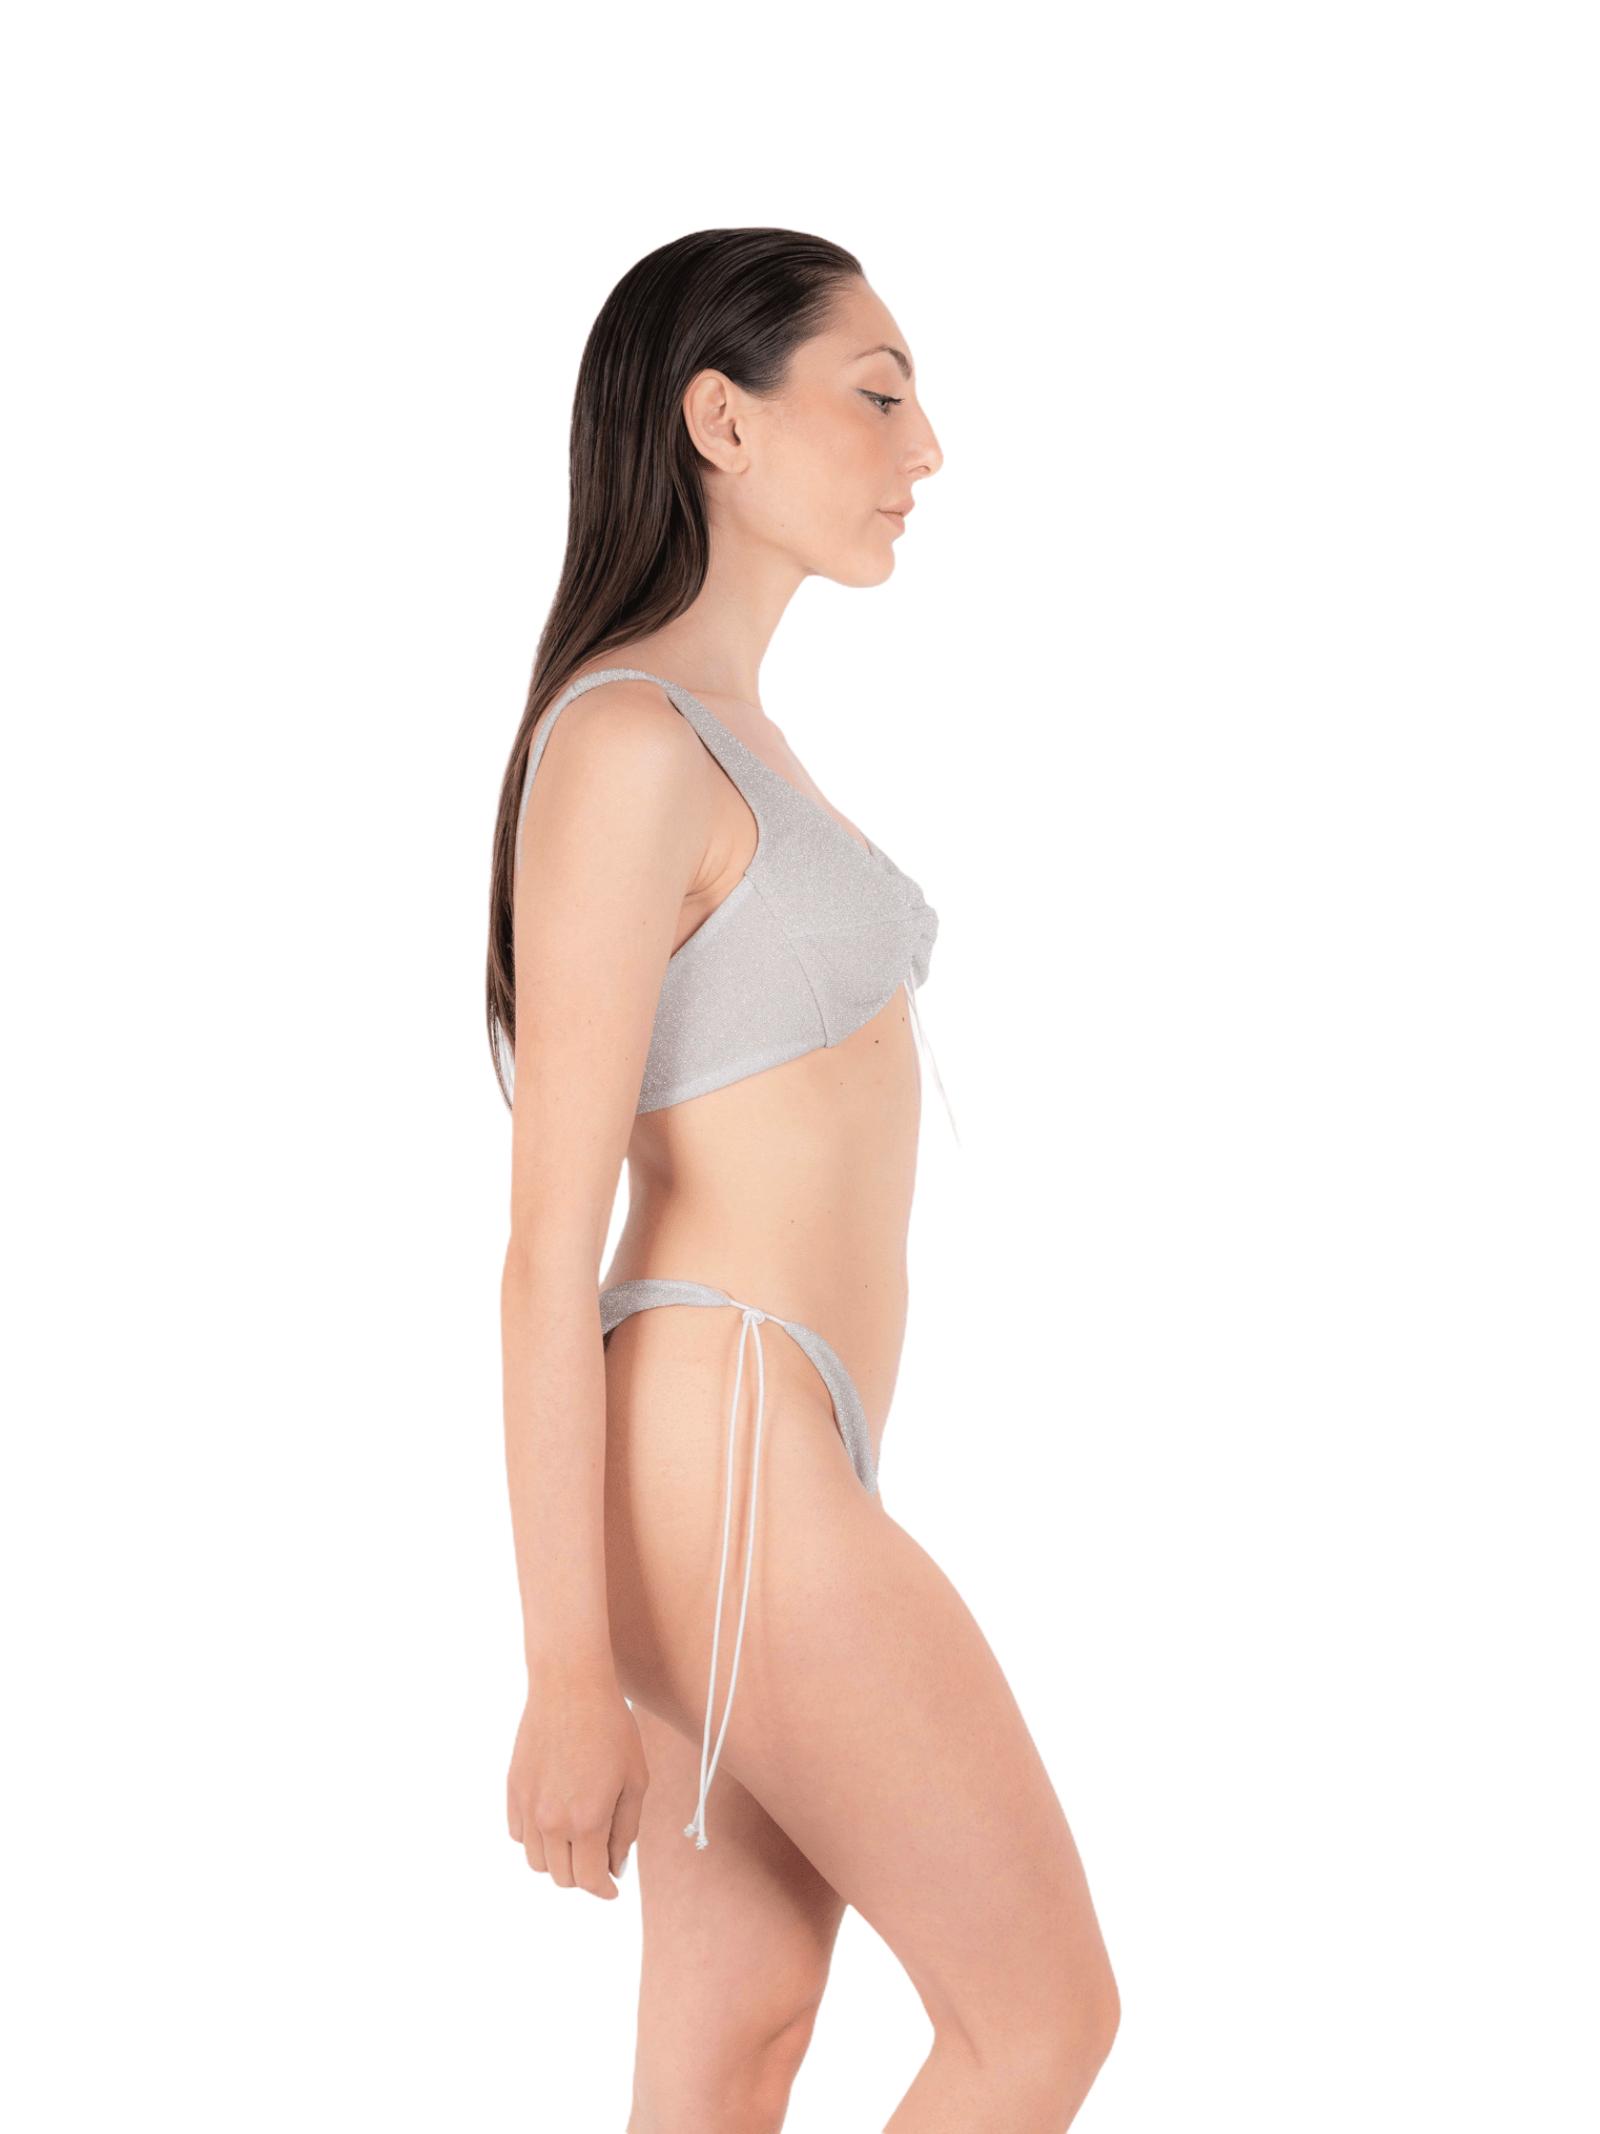 Bikini top with bow slip ANNAMARE   23   BK-110BIANCO